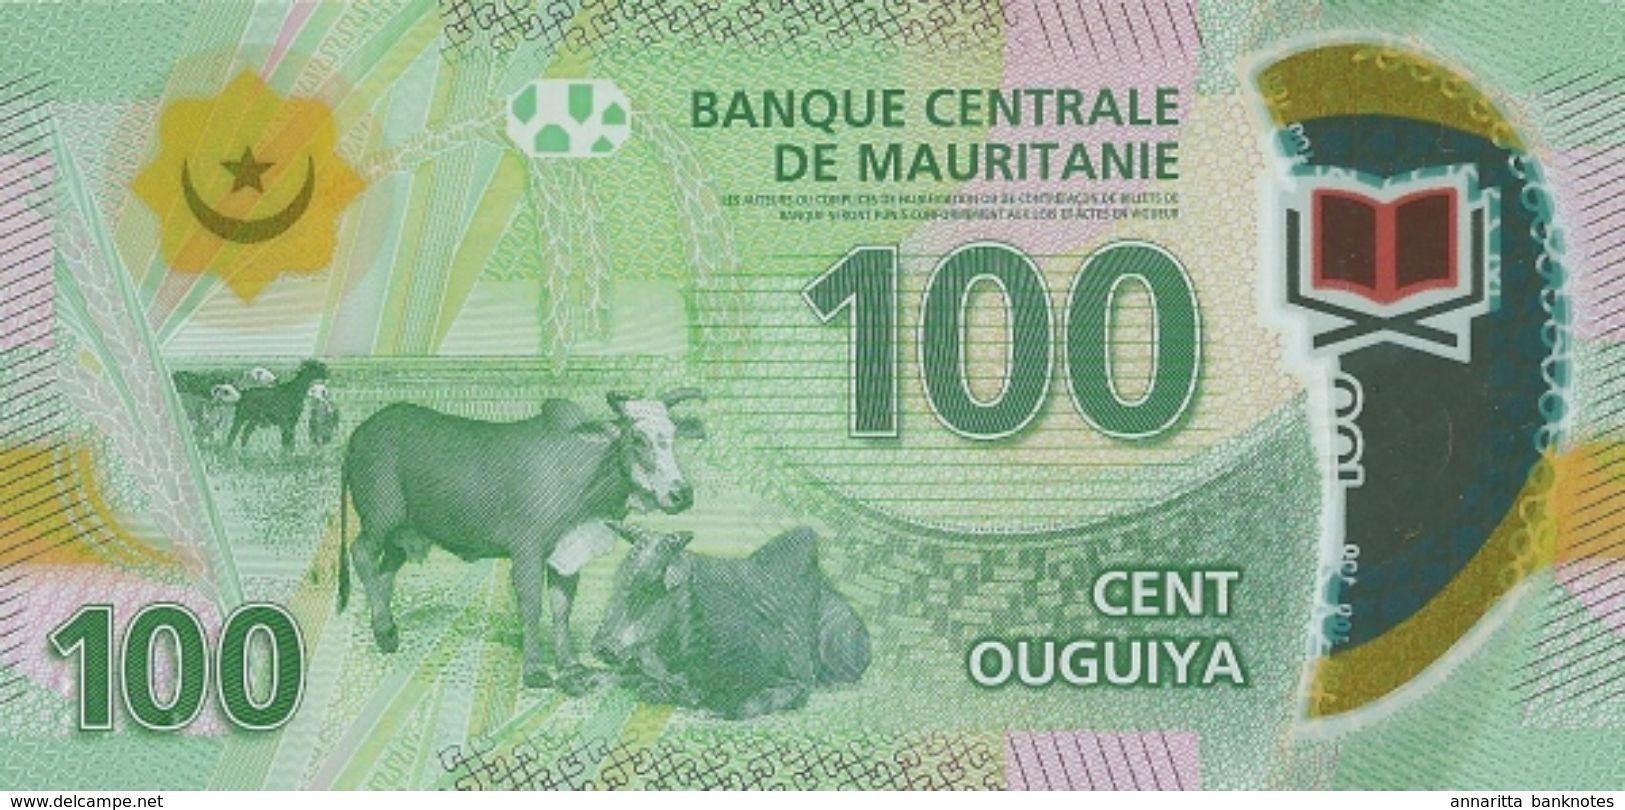 MAURITANIA 100 OUGUIYA 2017 P-23a UNC [MR127a] - Mauritania